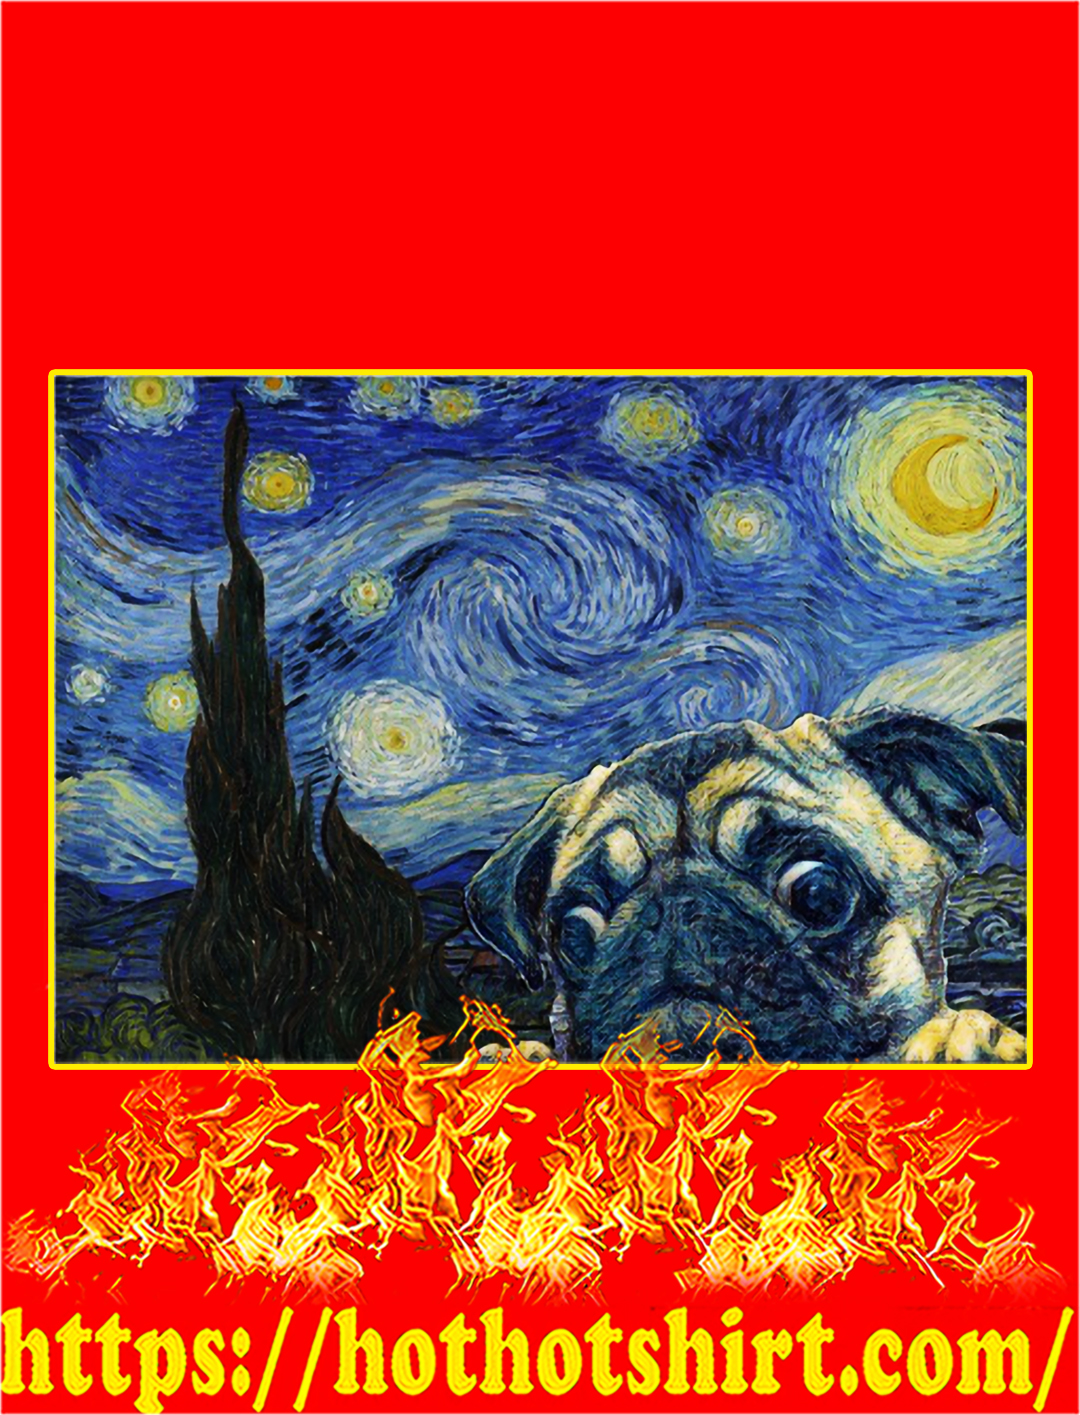 Pug Starry Night Van Gogh Poster - A2